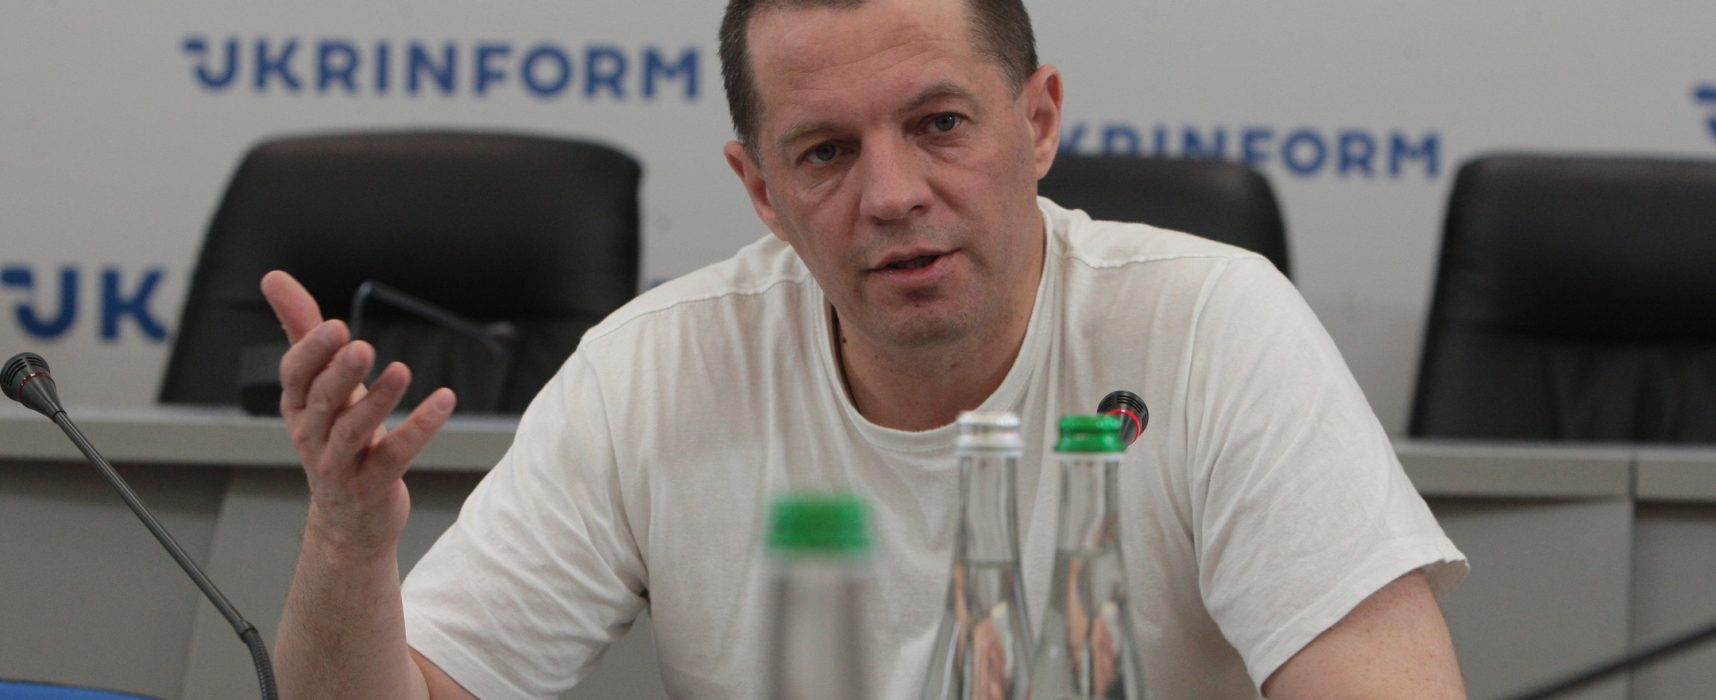 Roman Souchtchenko, journaliste, ancien prisonnier politique du Kremlin